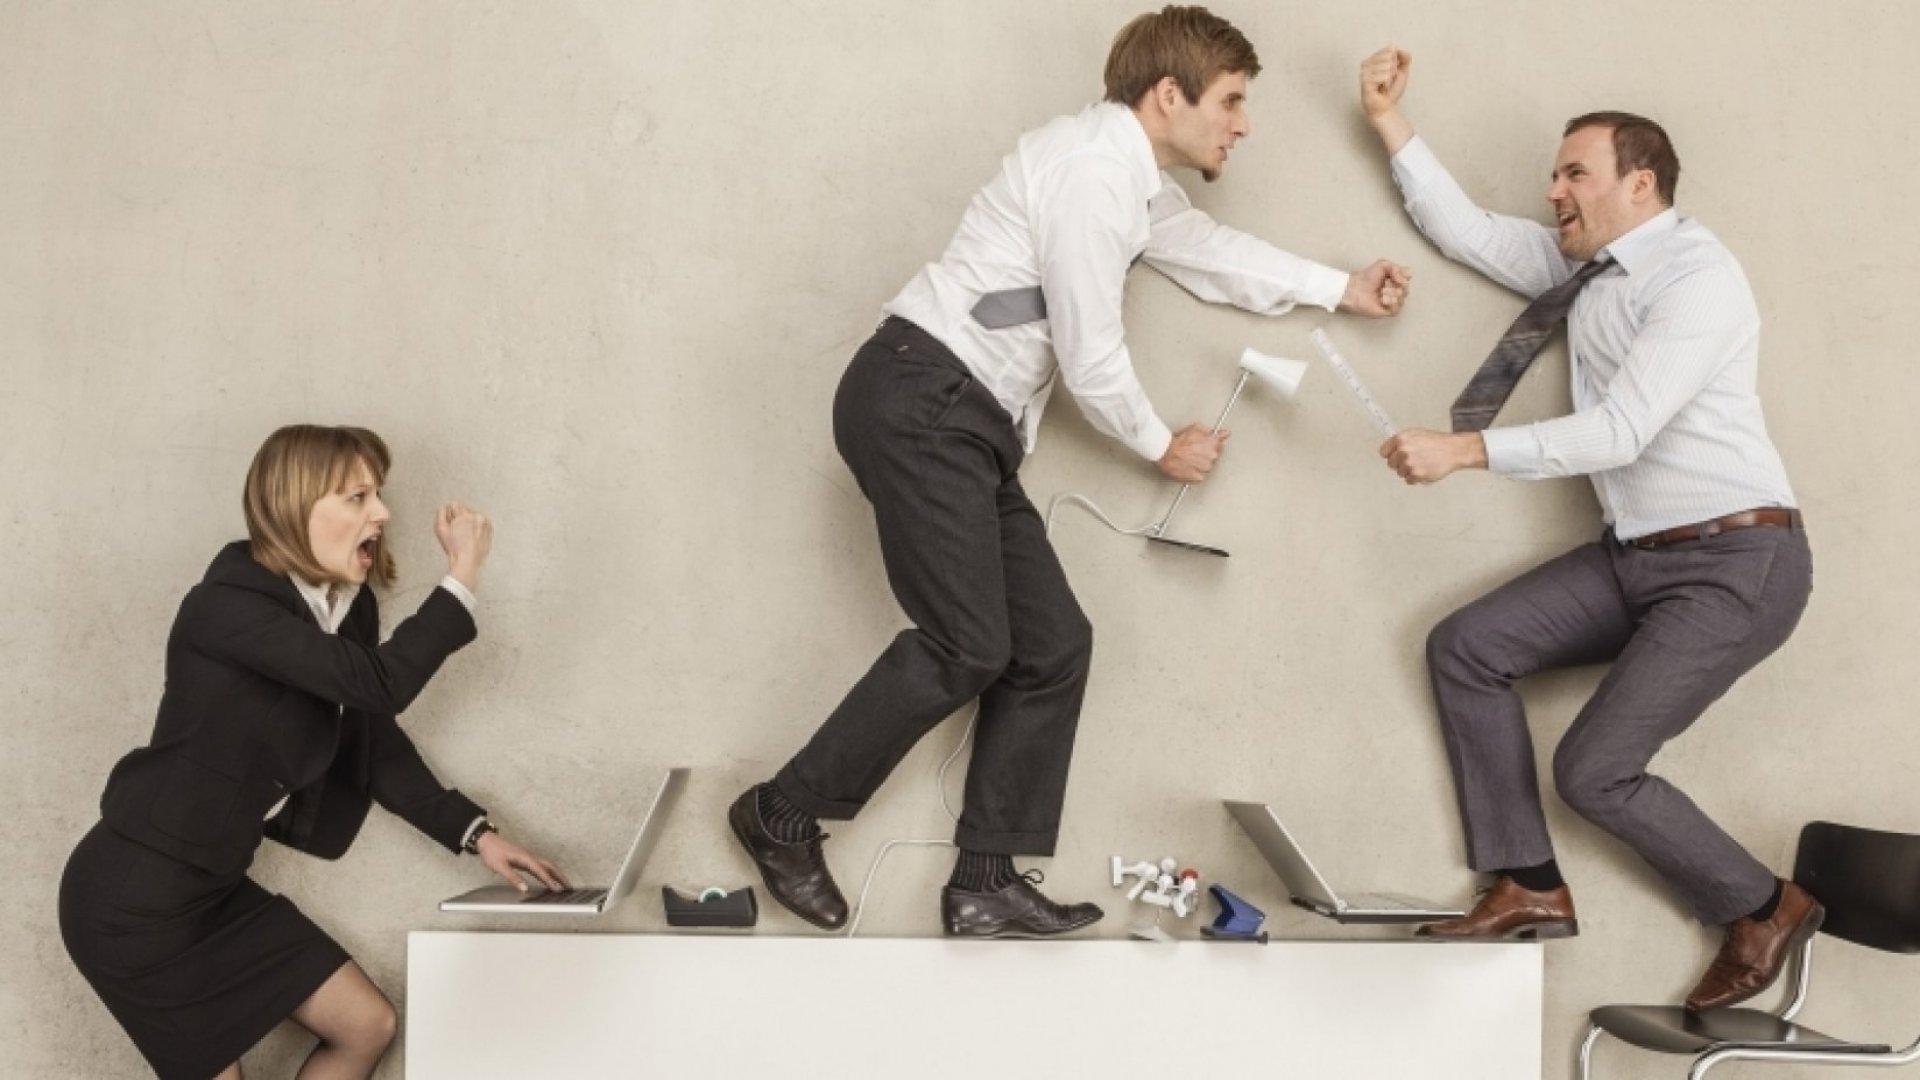 5 Super Effective Hacks for Handling the Office Jerk